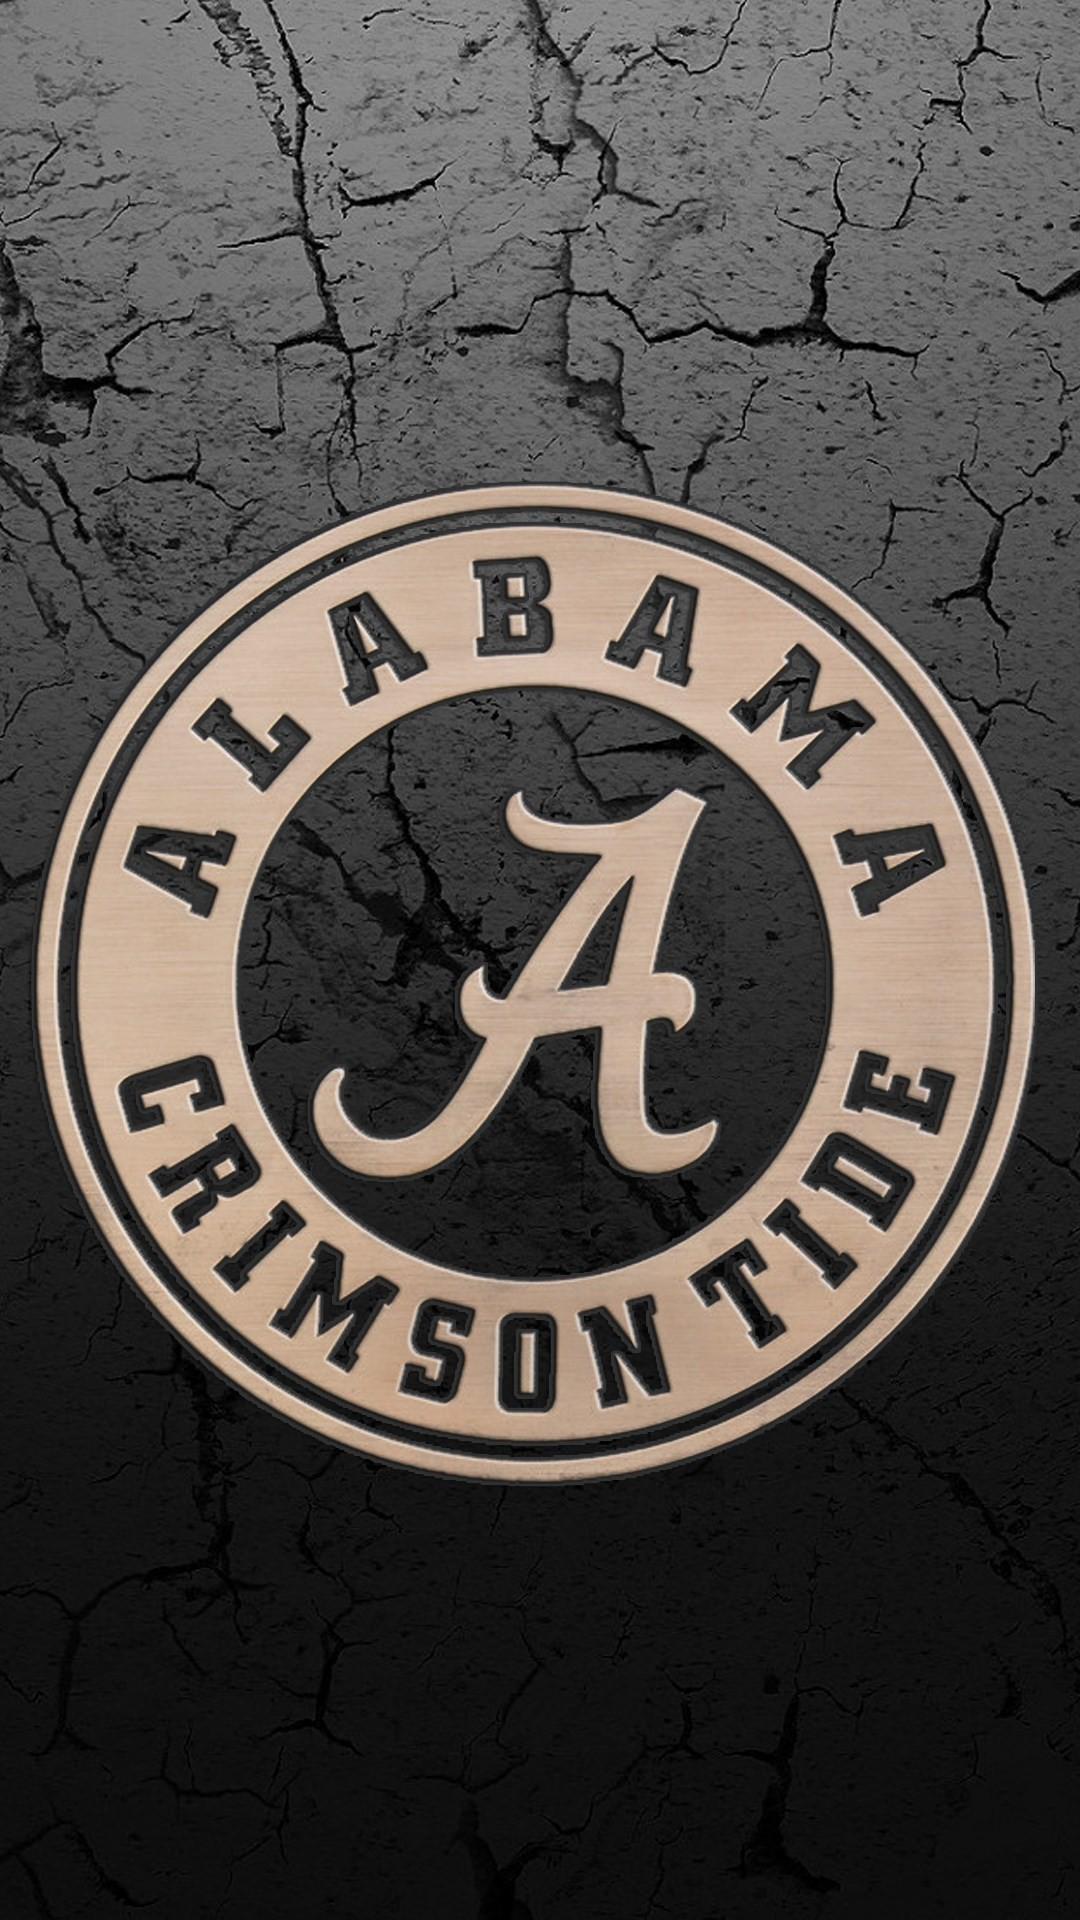 Alabama Crimson Tide Iphone Wallpaper Alabama Crimson Tide Wallpaper 183 ①